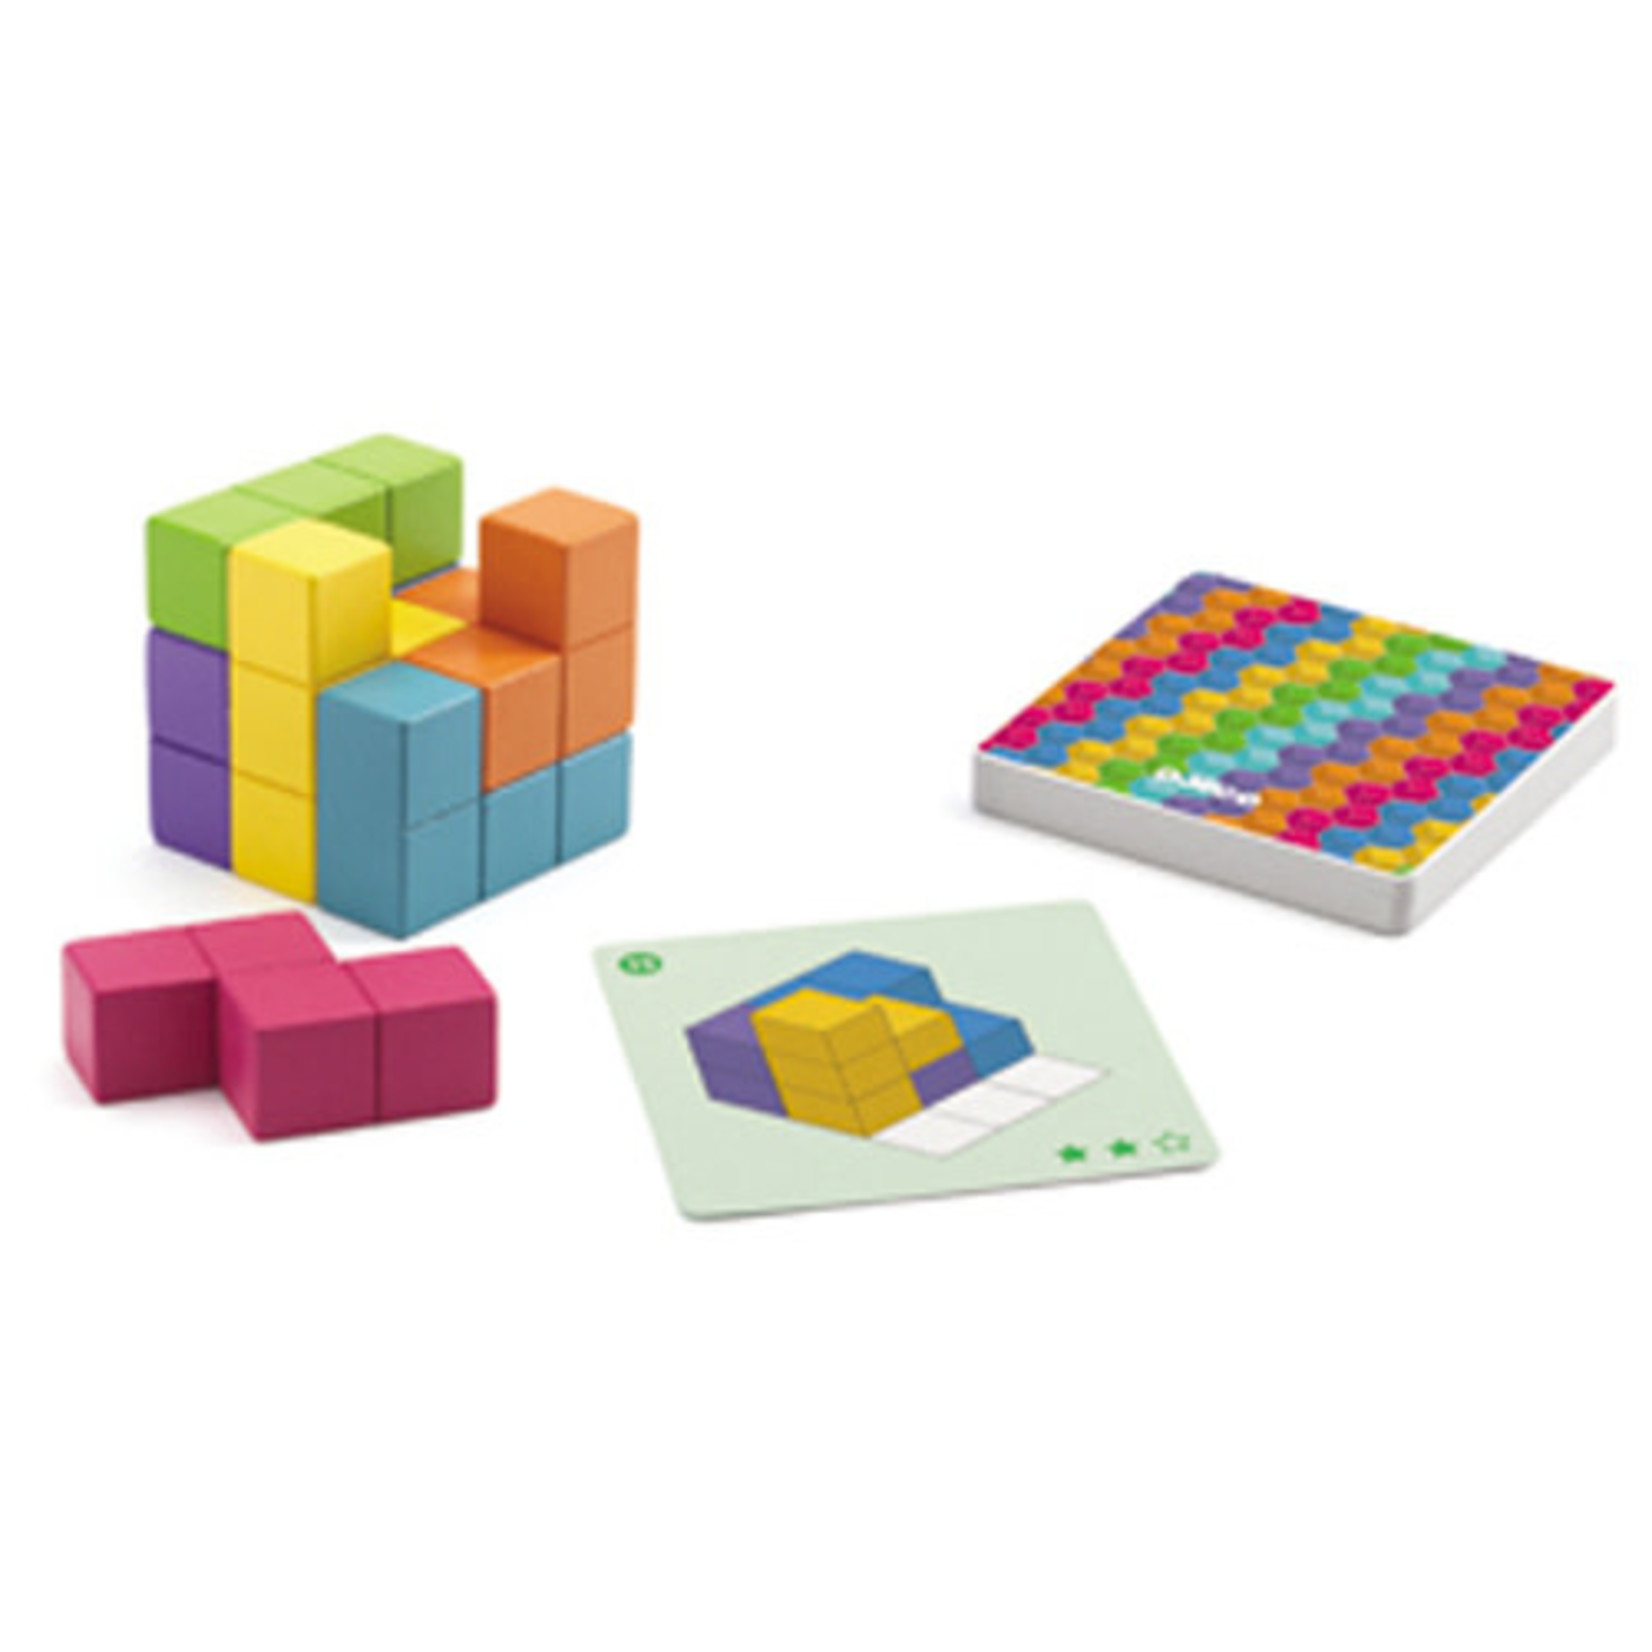 Djeco Cubissimo (Multilingue)